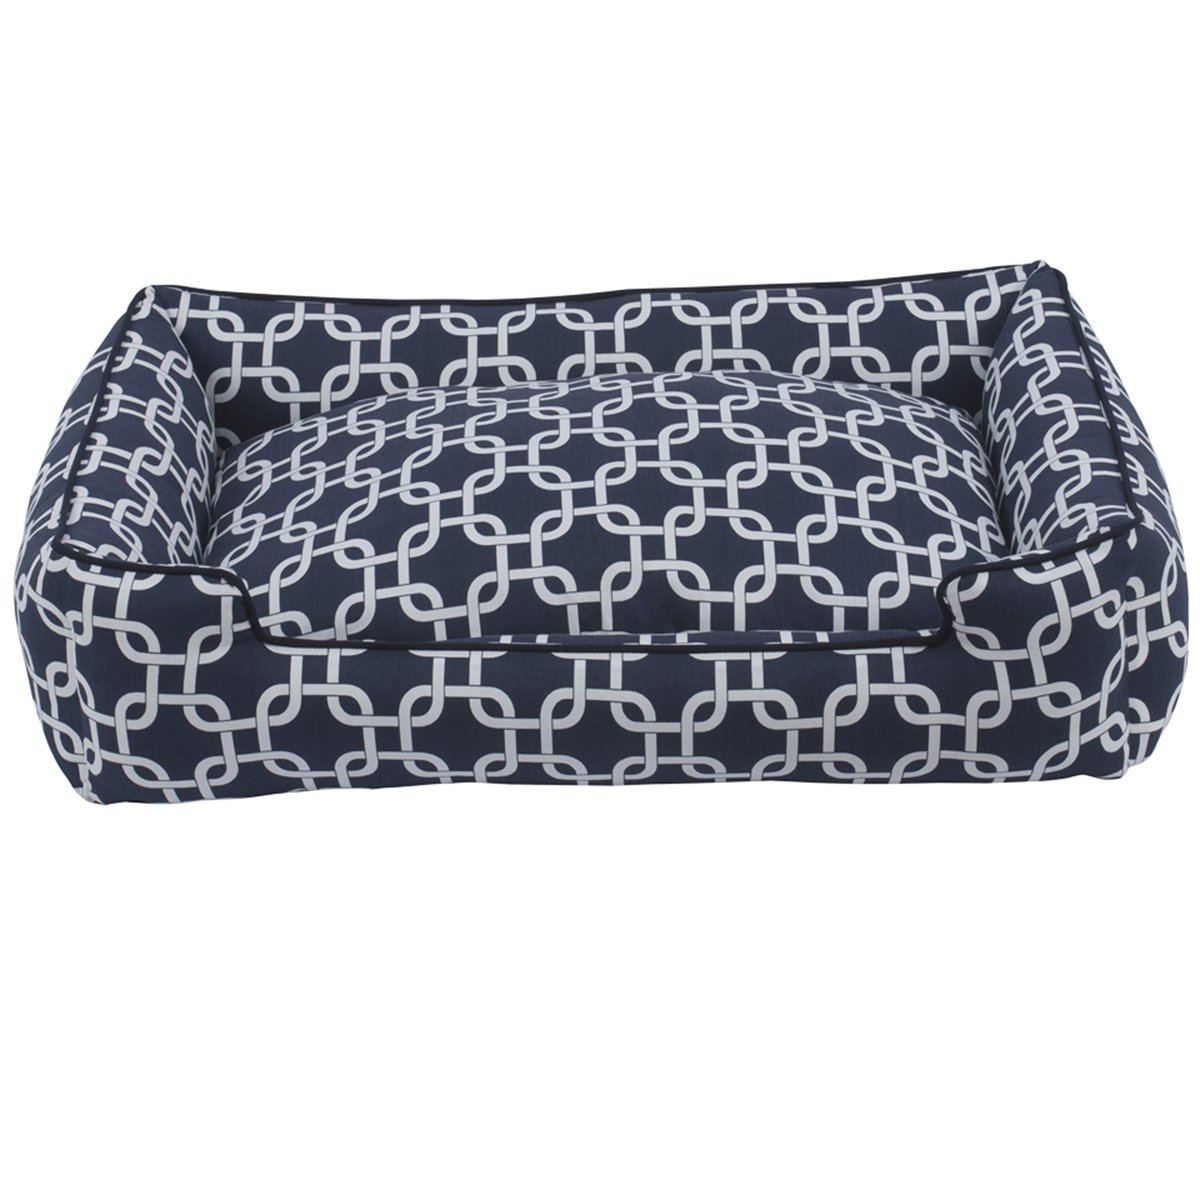 Jax and Bones 32 x 27 x 10'' Standard Everyday Cotton Lounge Dog Bed, Medium, Marine